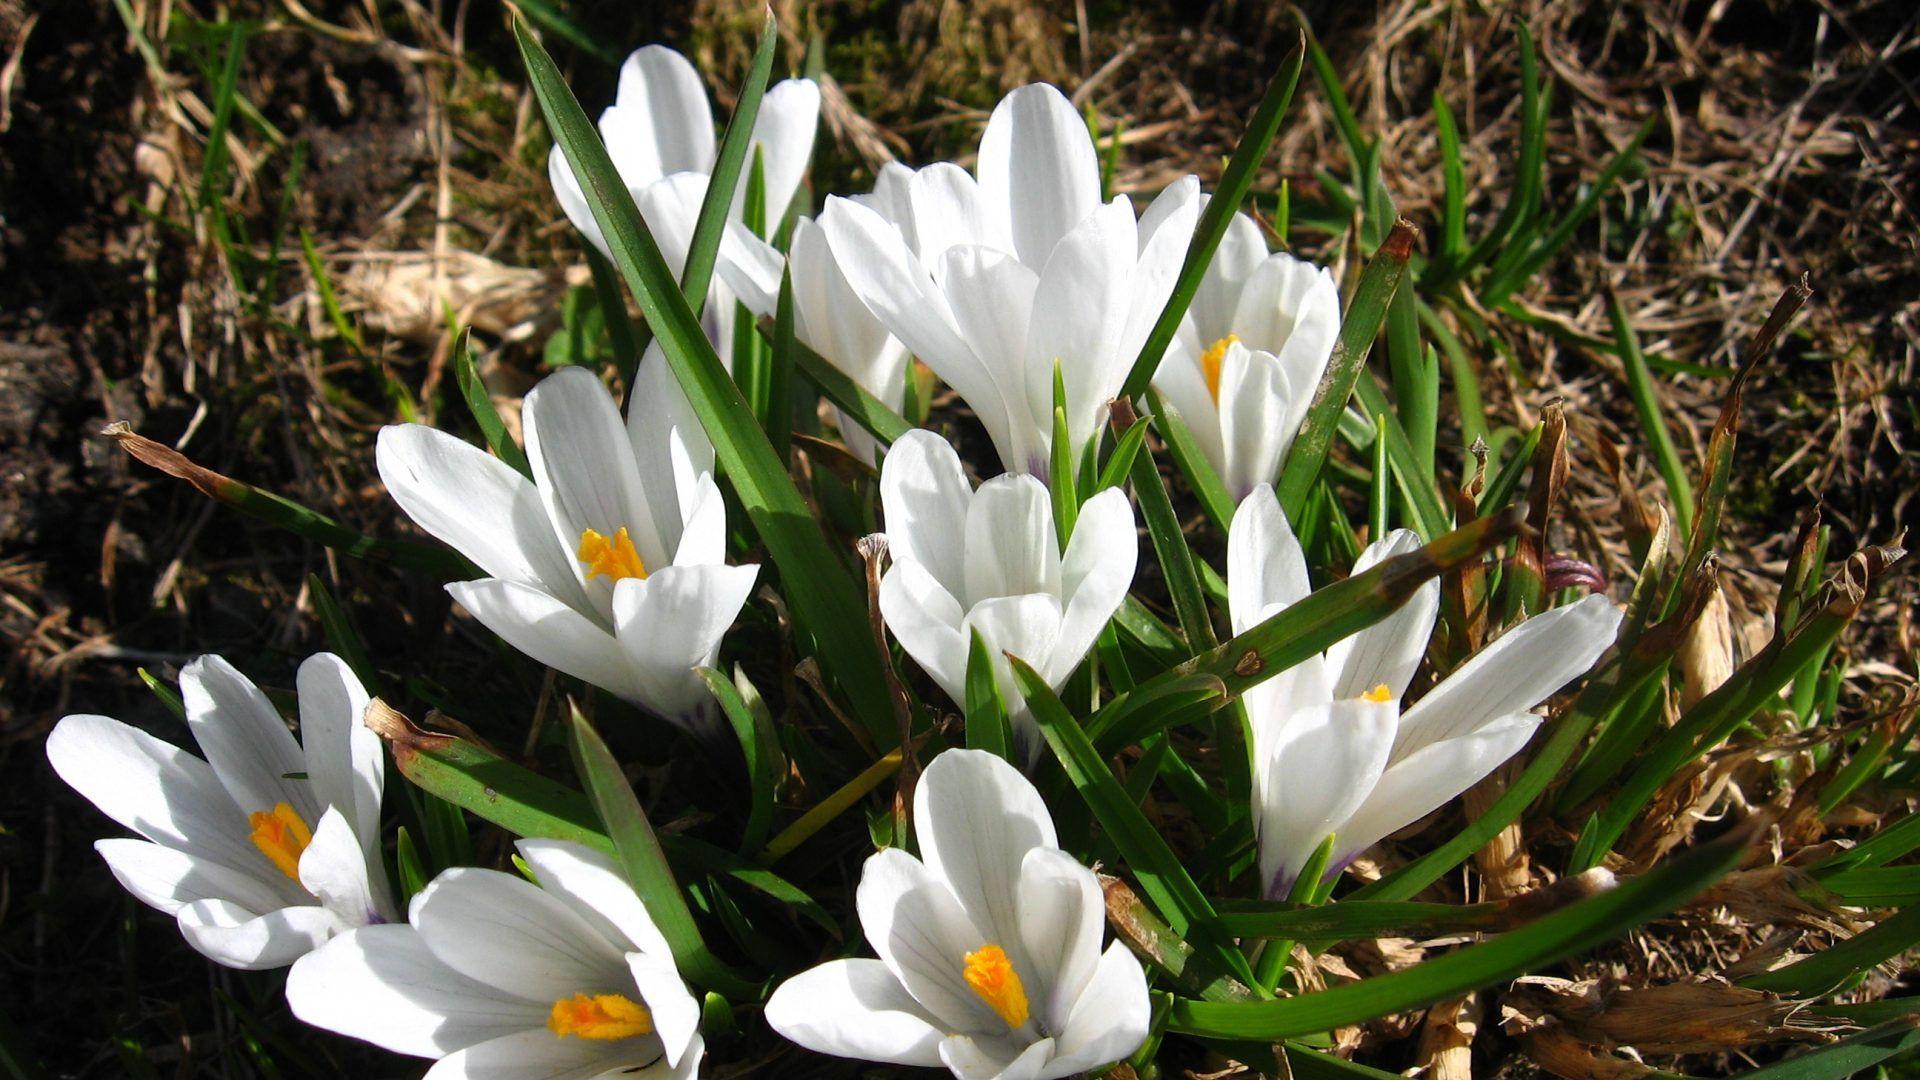 Flowers White Flower Crocus Corm Flowering Bulb Spring Picture New